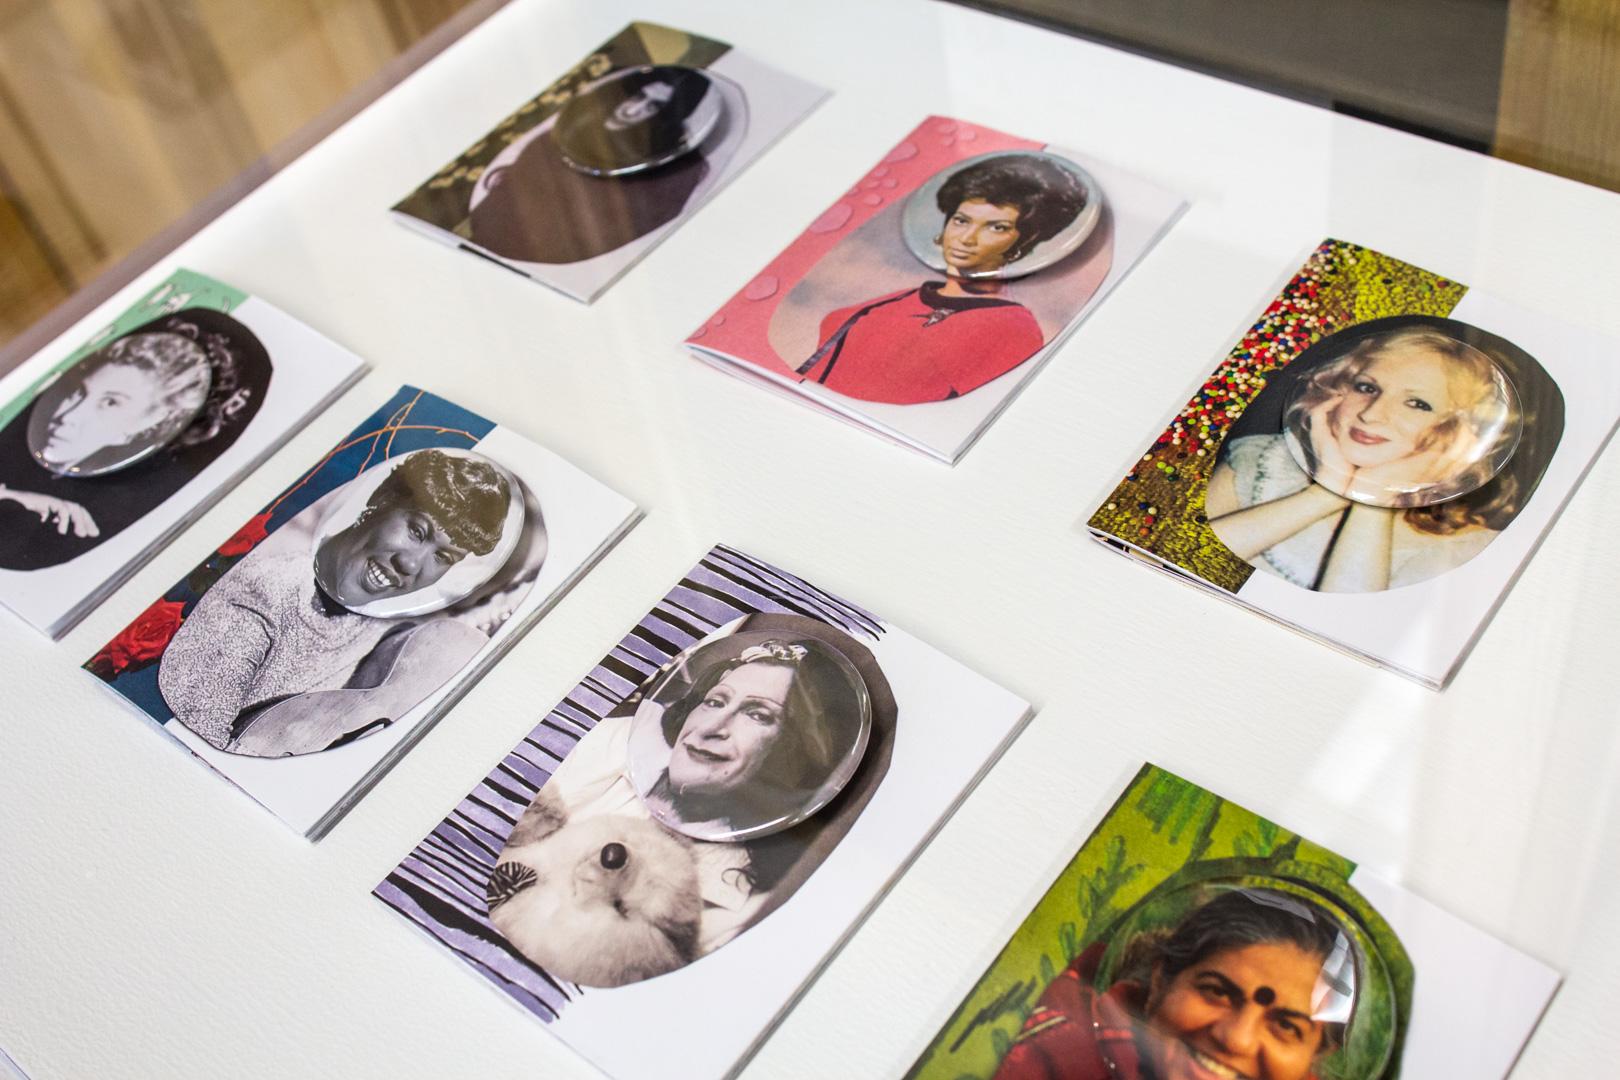 Women's Book Arts in the Bullitt Library